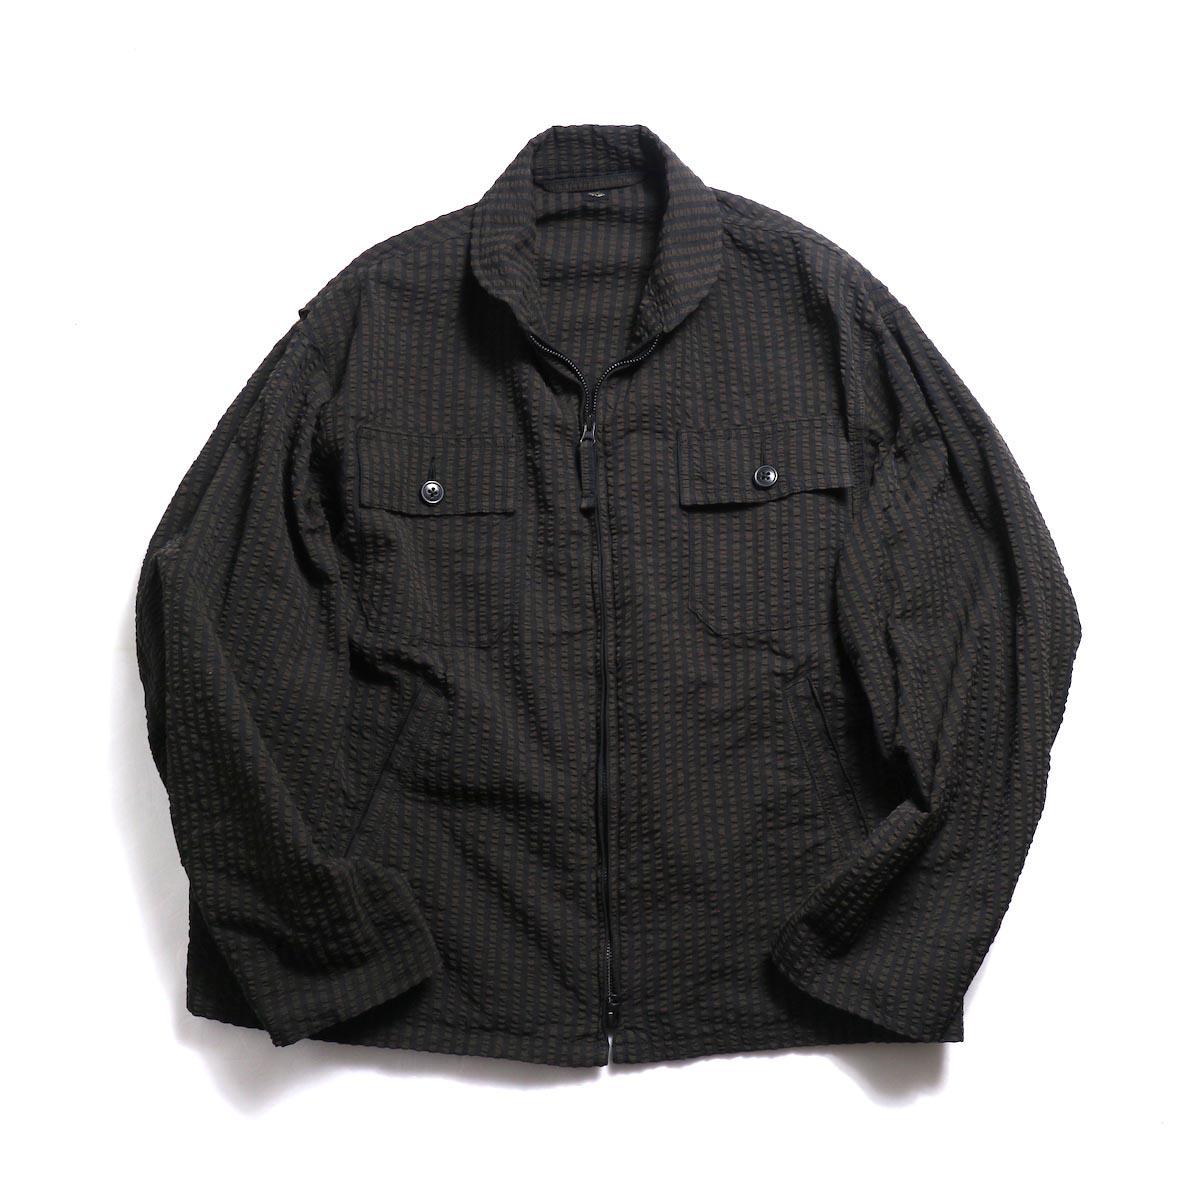 Kaptain Sunshine / Summer Flight Jacket -Black/Brown